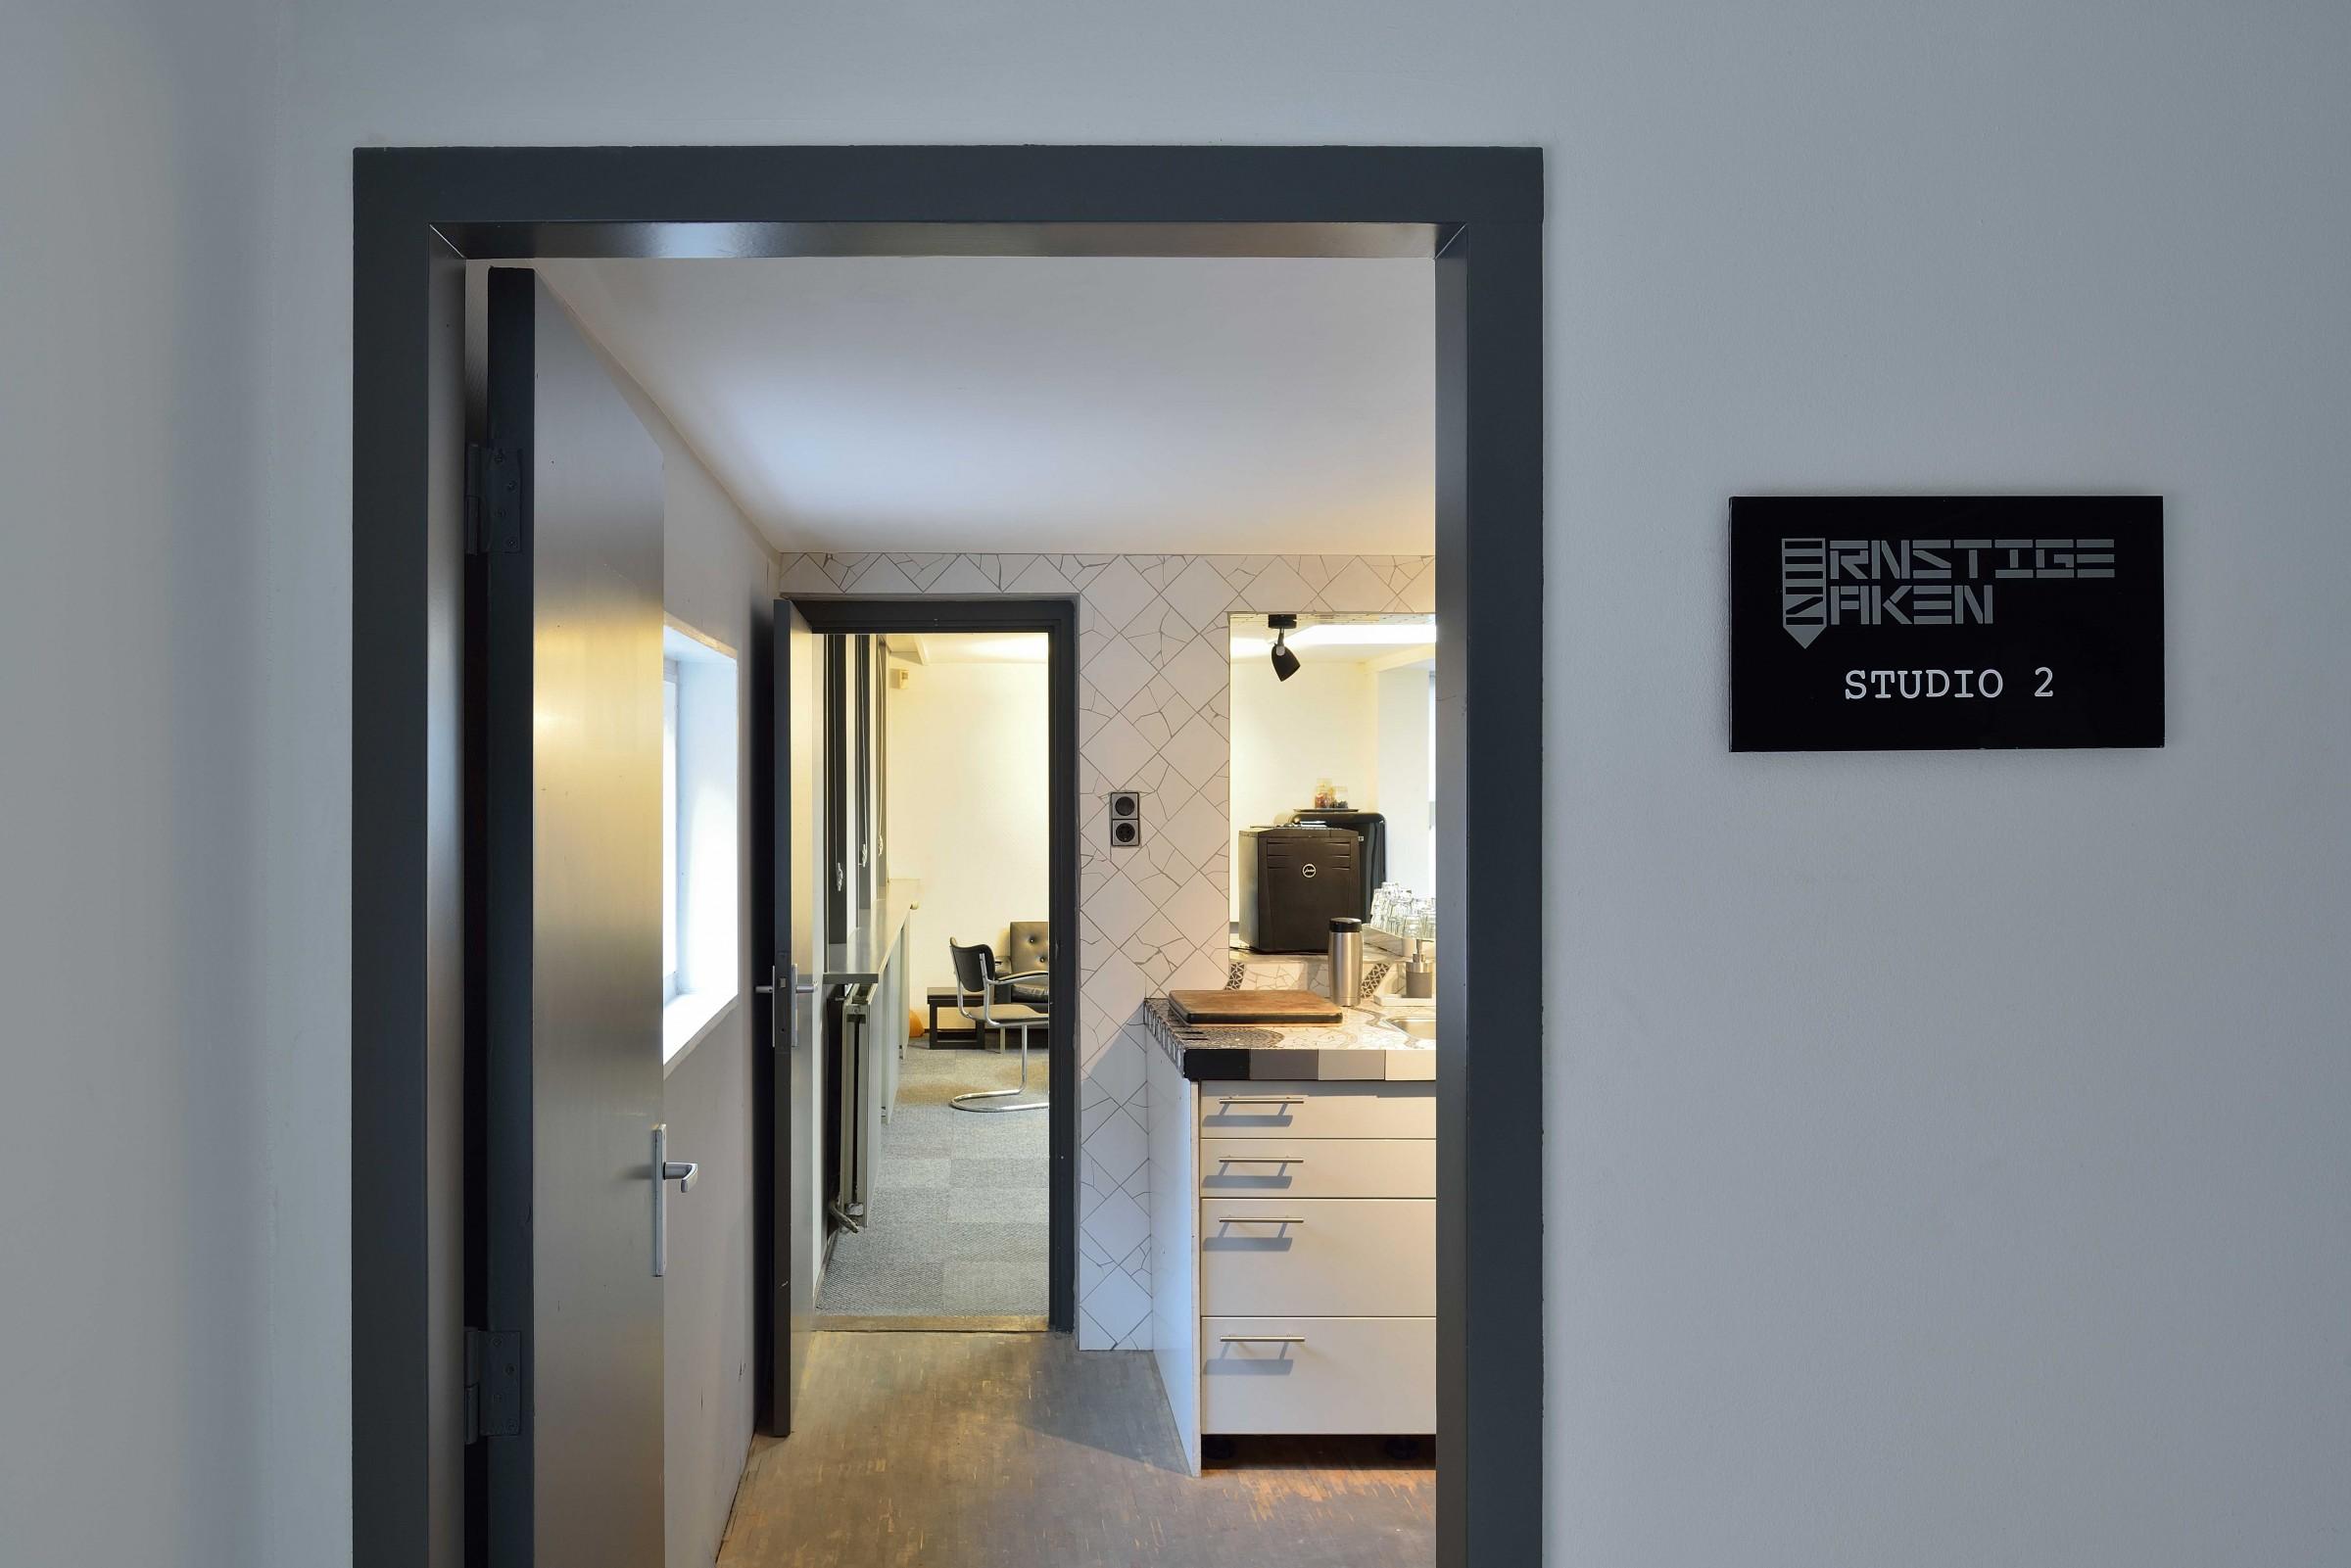 Keuken fotostudio 2